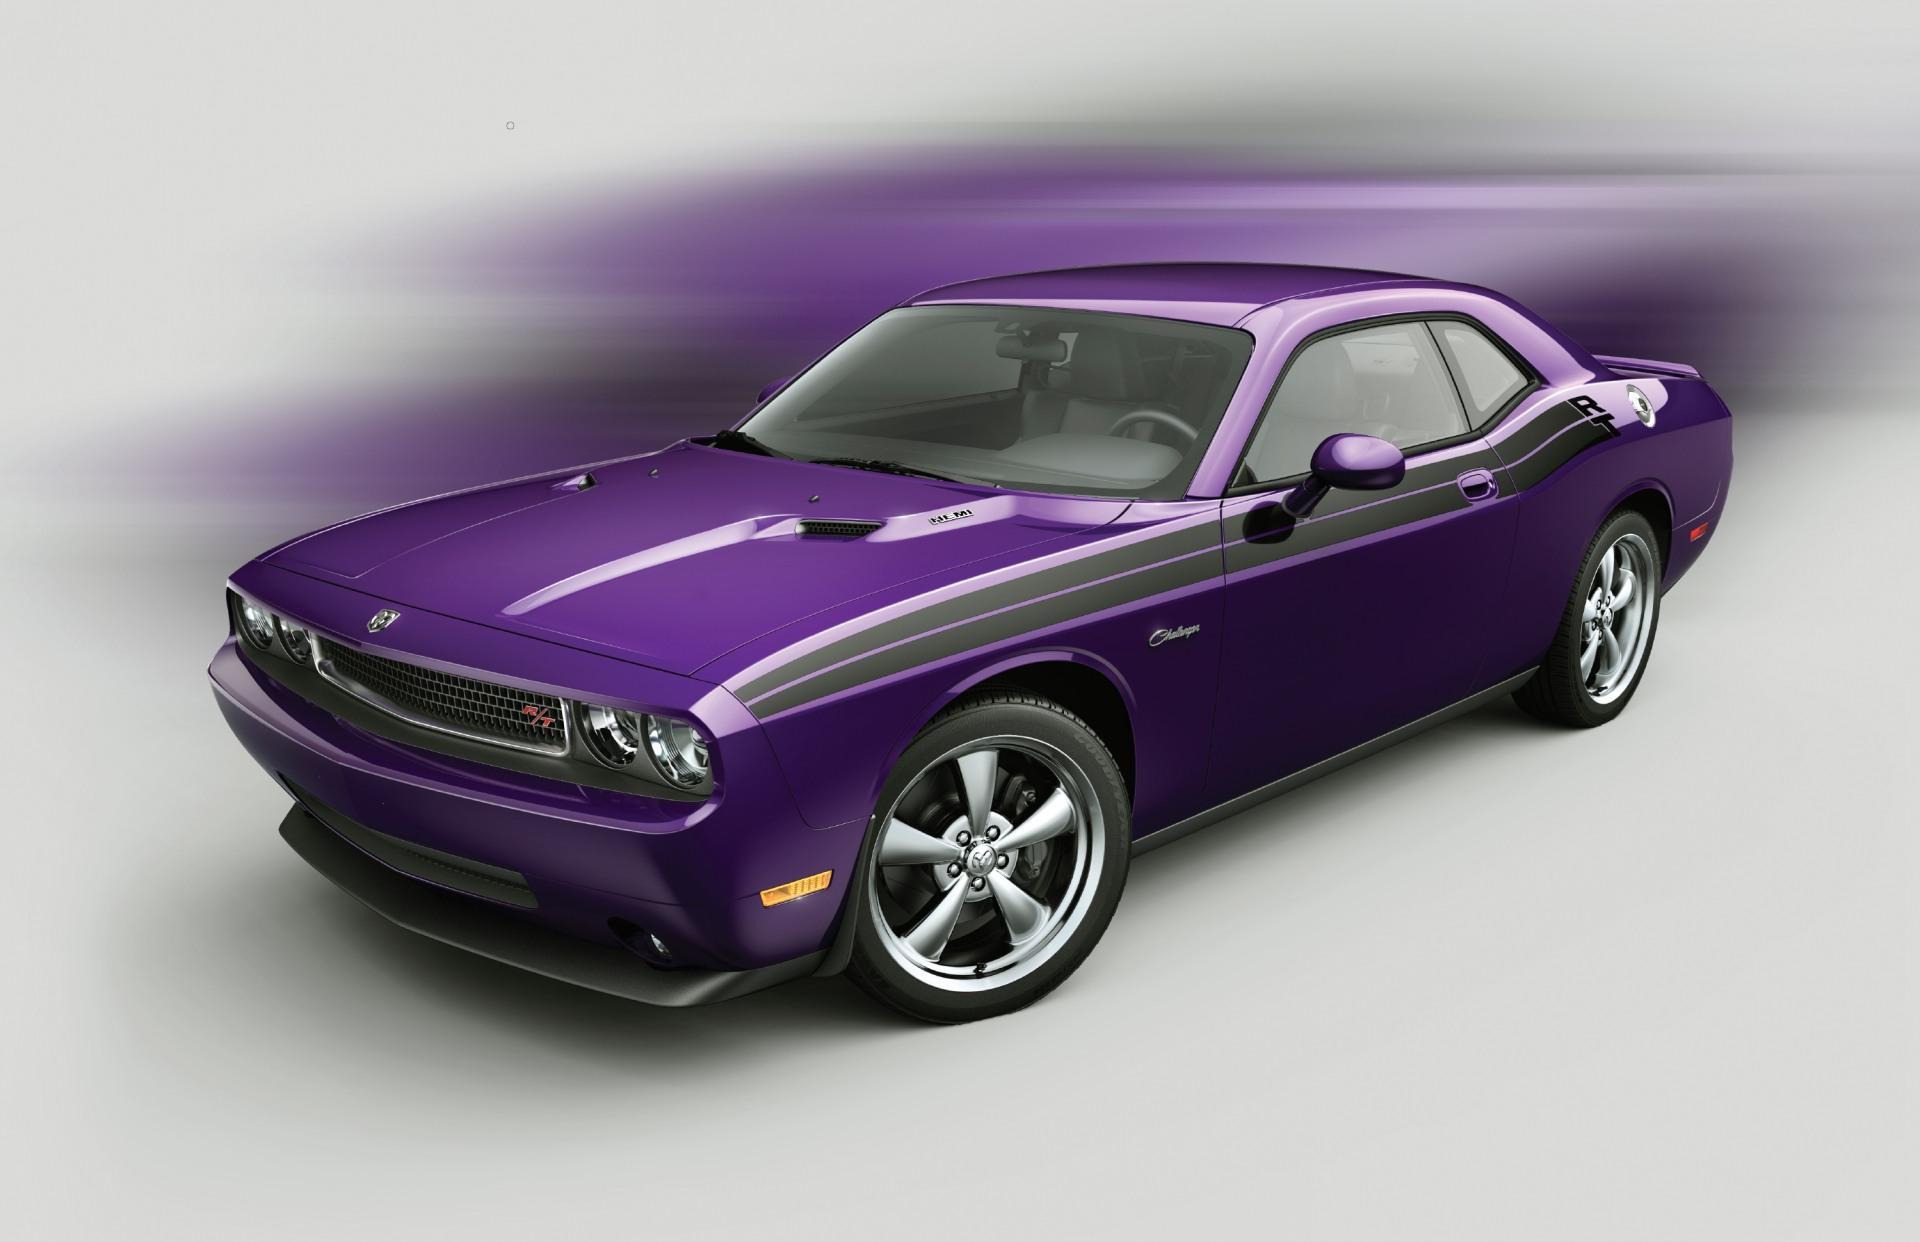 2010 Dodge Challenger Plum Crazy News And Information